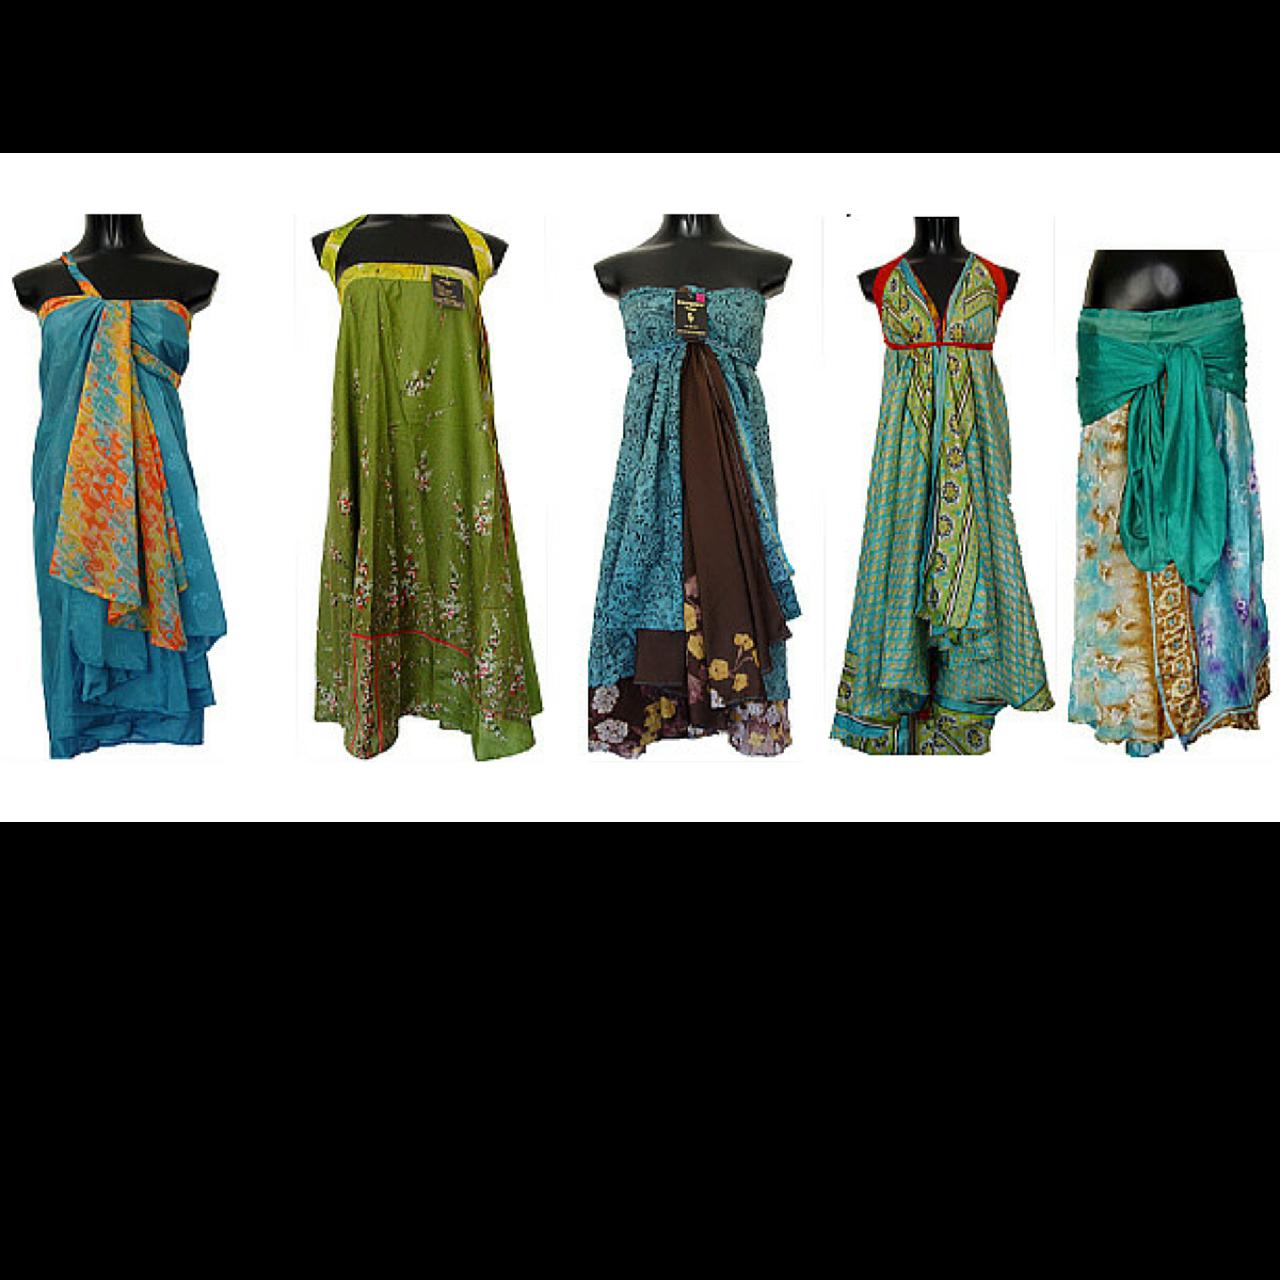 Vintage Silk Sari Skirt,Maxi,Short Dress Printed Boho Gypsy Recycled bohemian clothing Women skirts maxi skirt One Piece Dress Party Dress